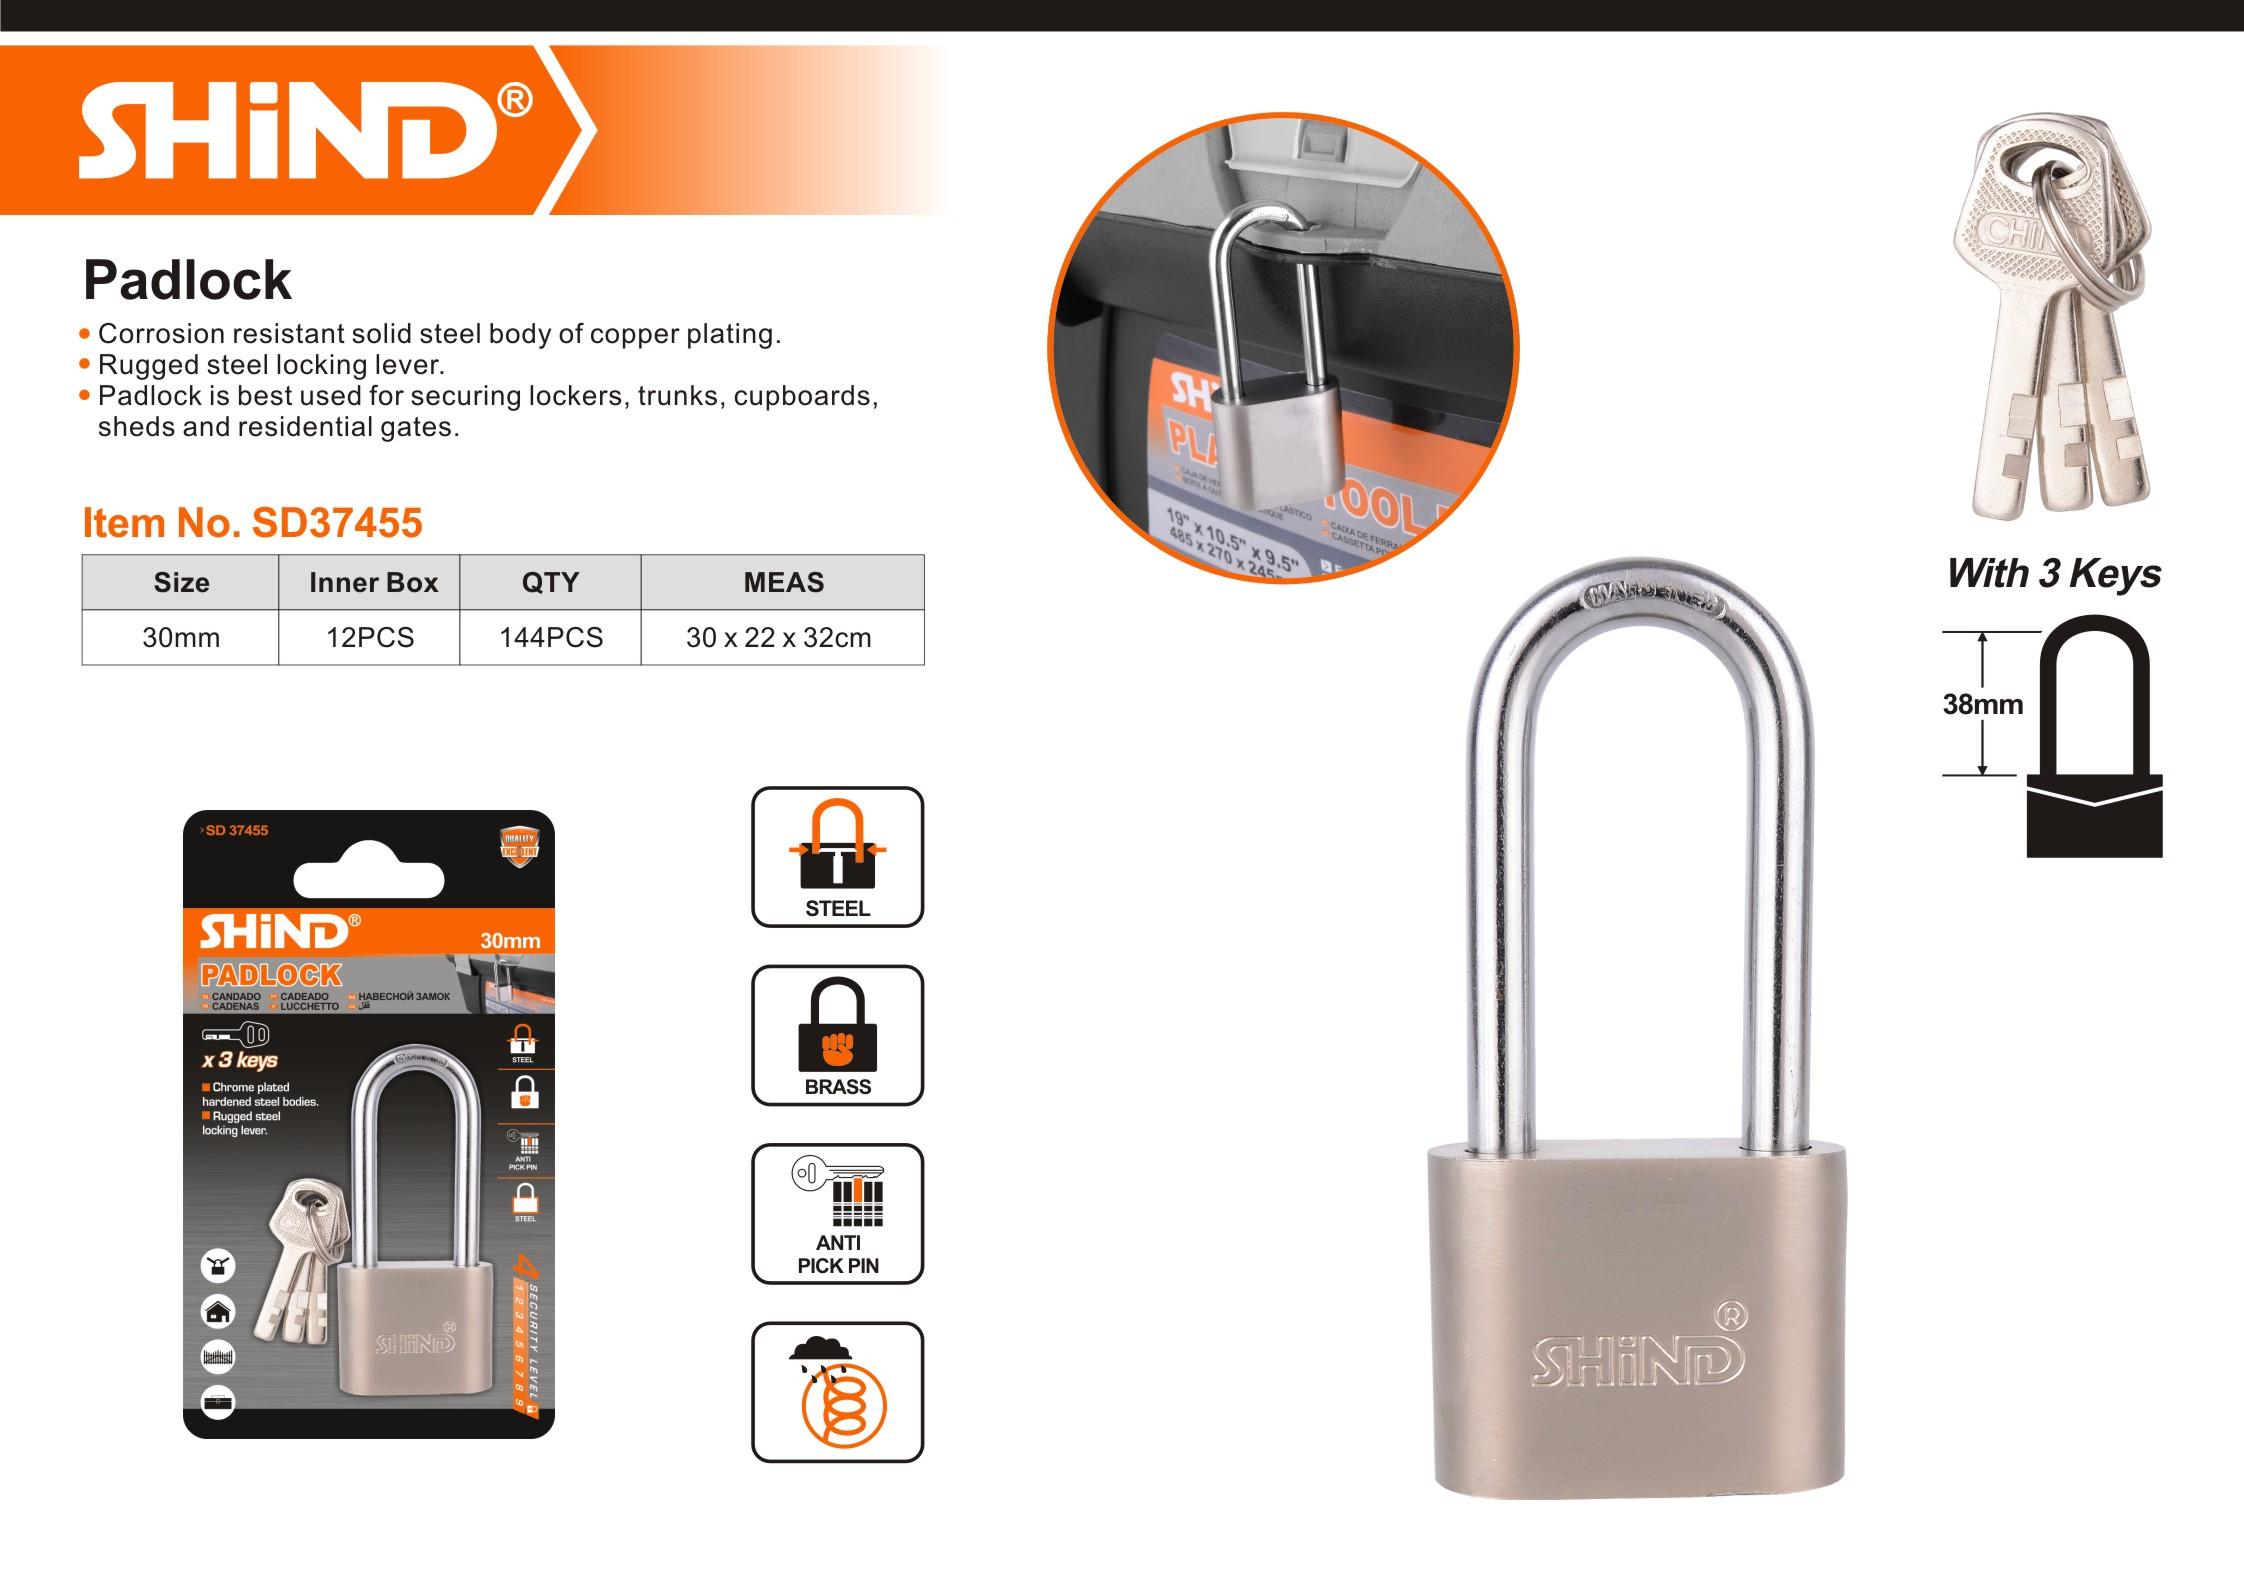 MAXIMUM  SECURITY HARDENED SOLID STEEL 3 KEYS HEAVY  DUTY  65mm PADLOCK